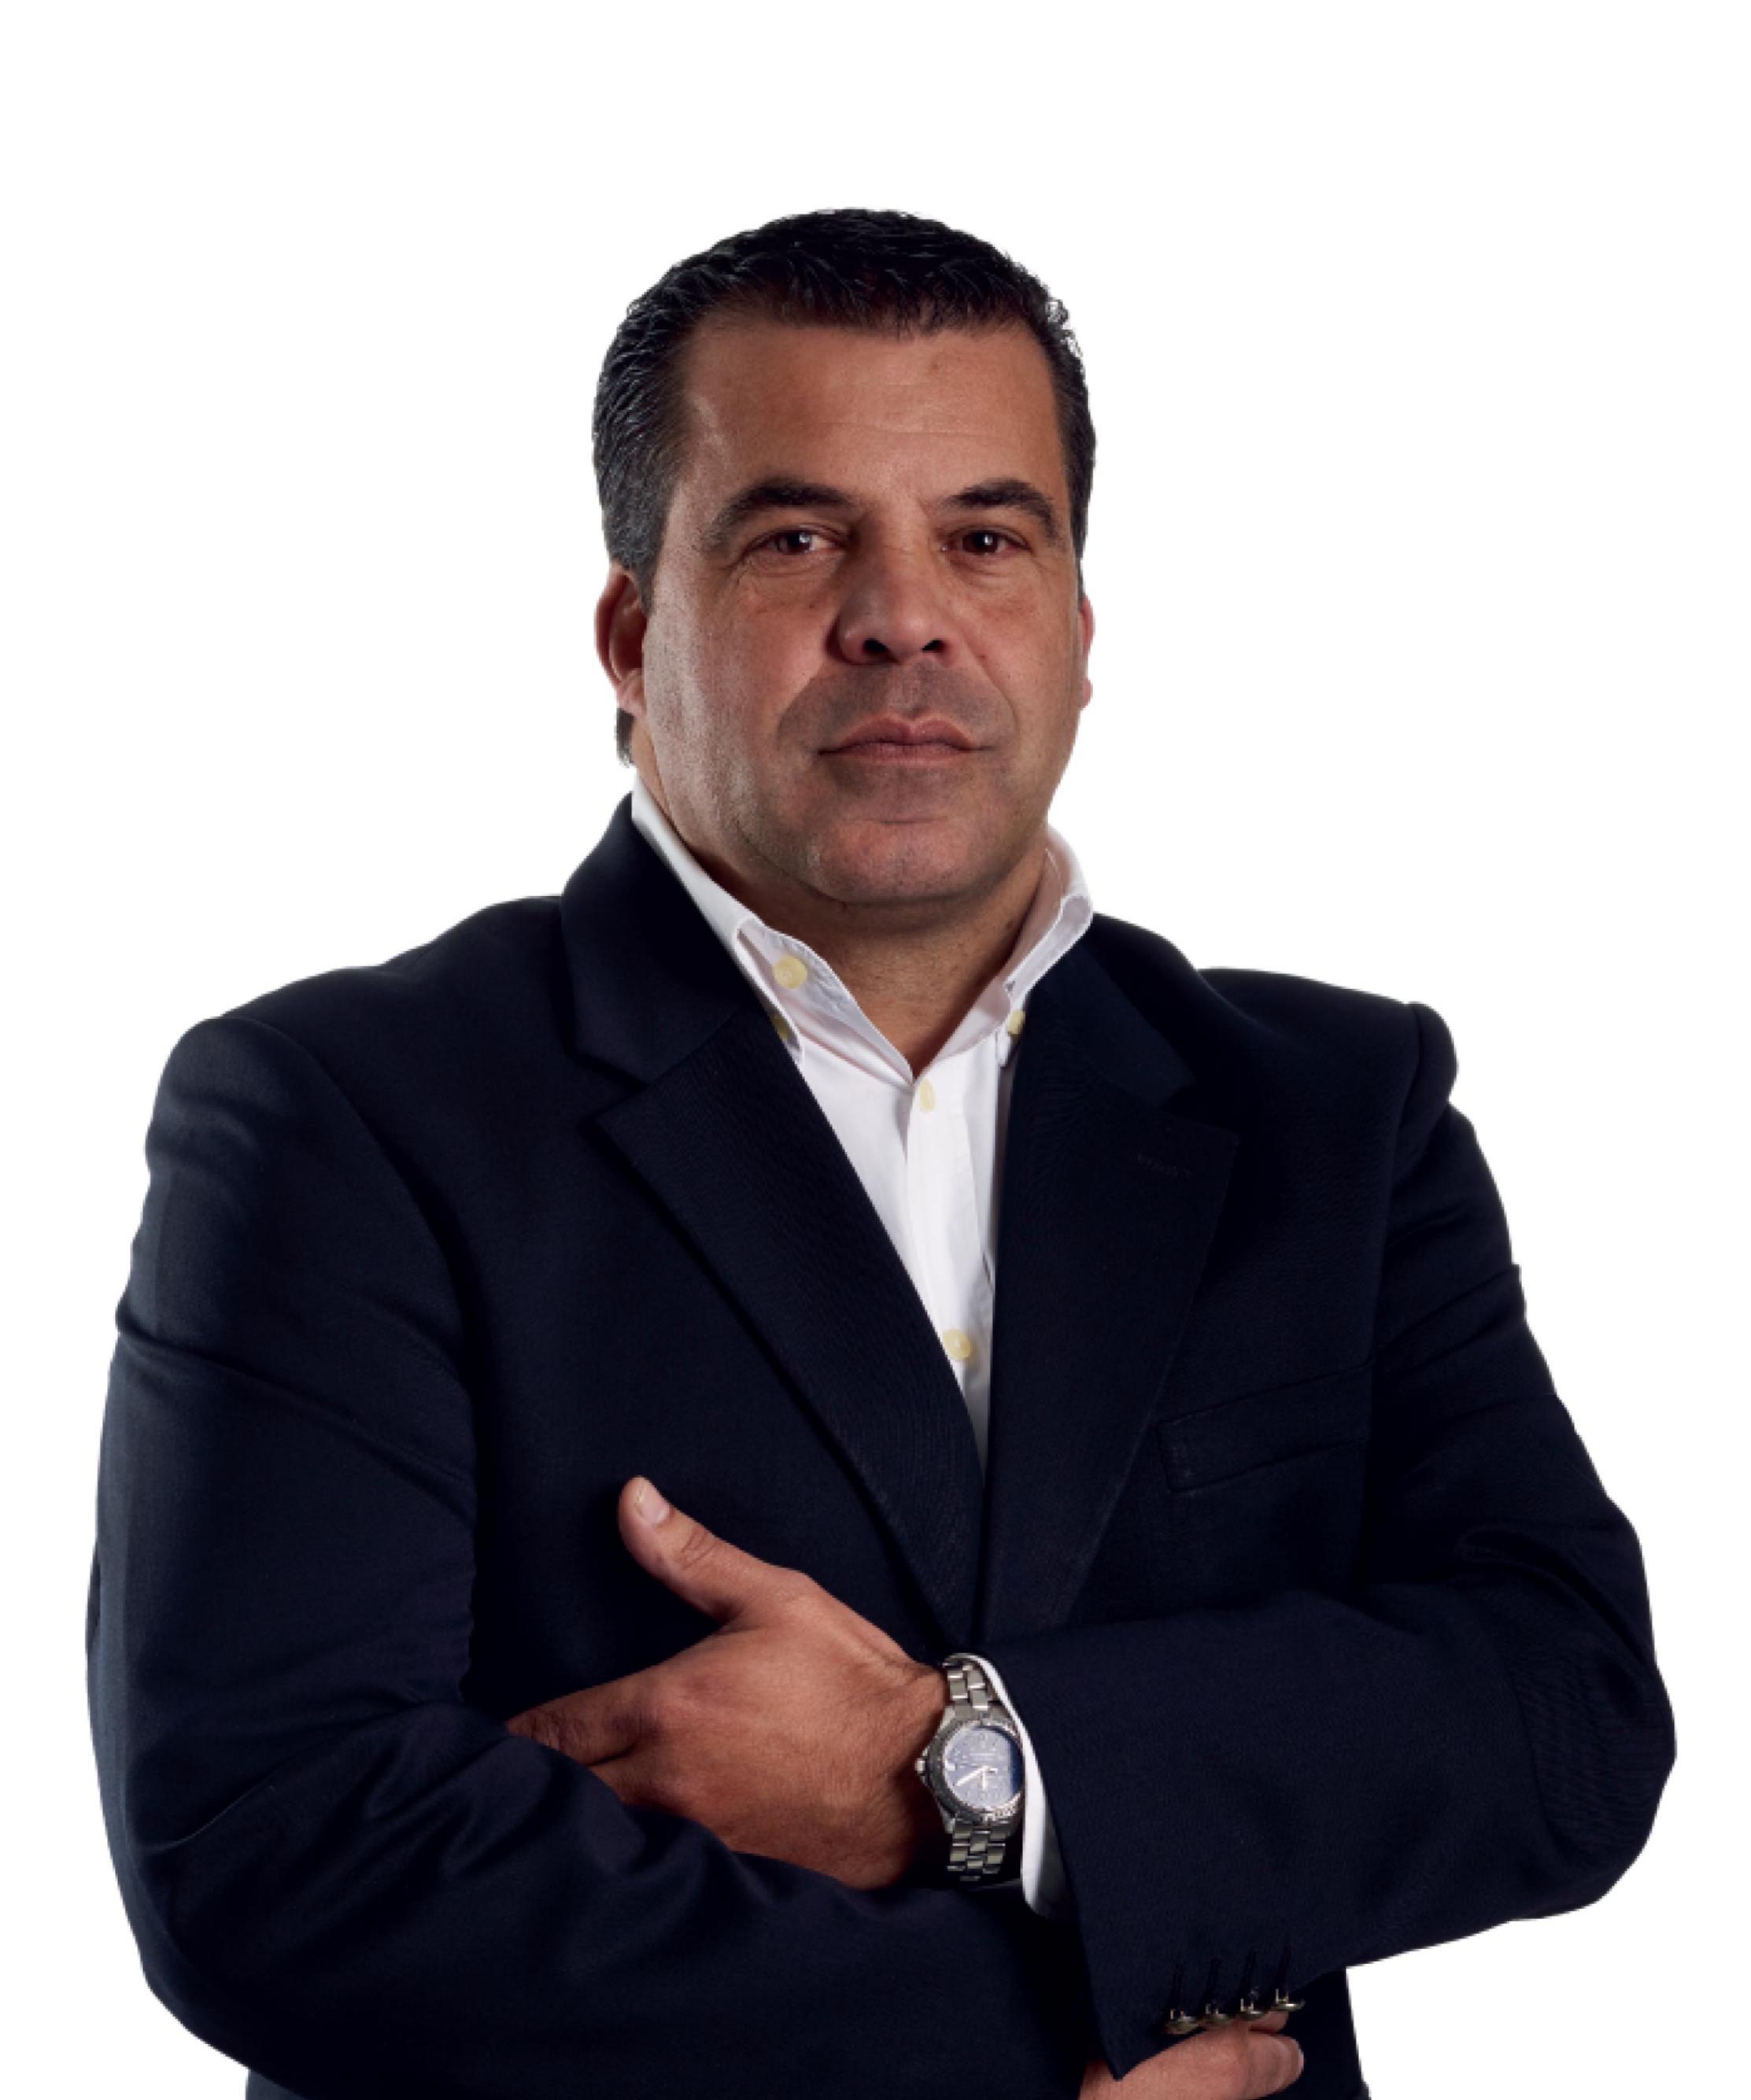 Paulo Paredes